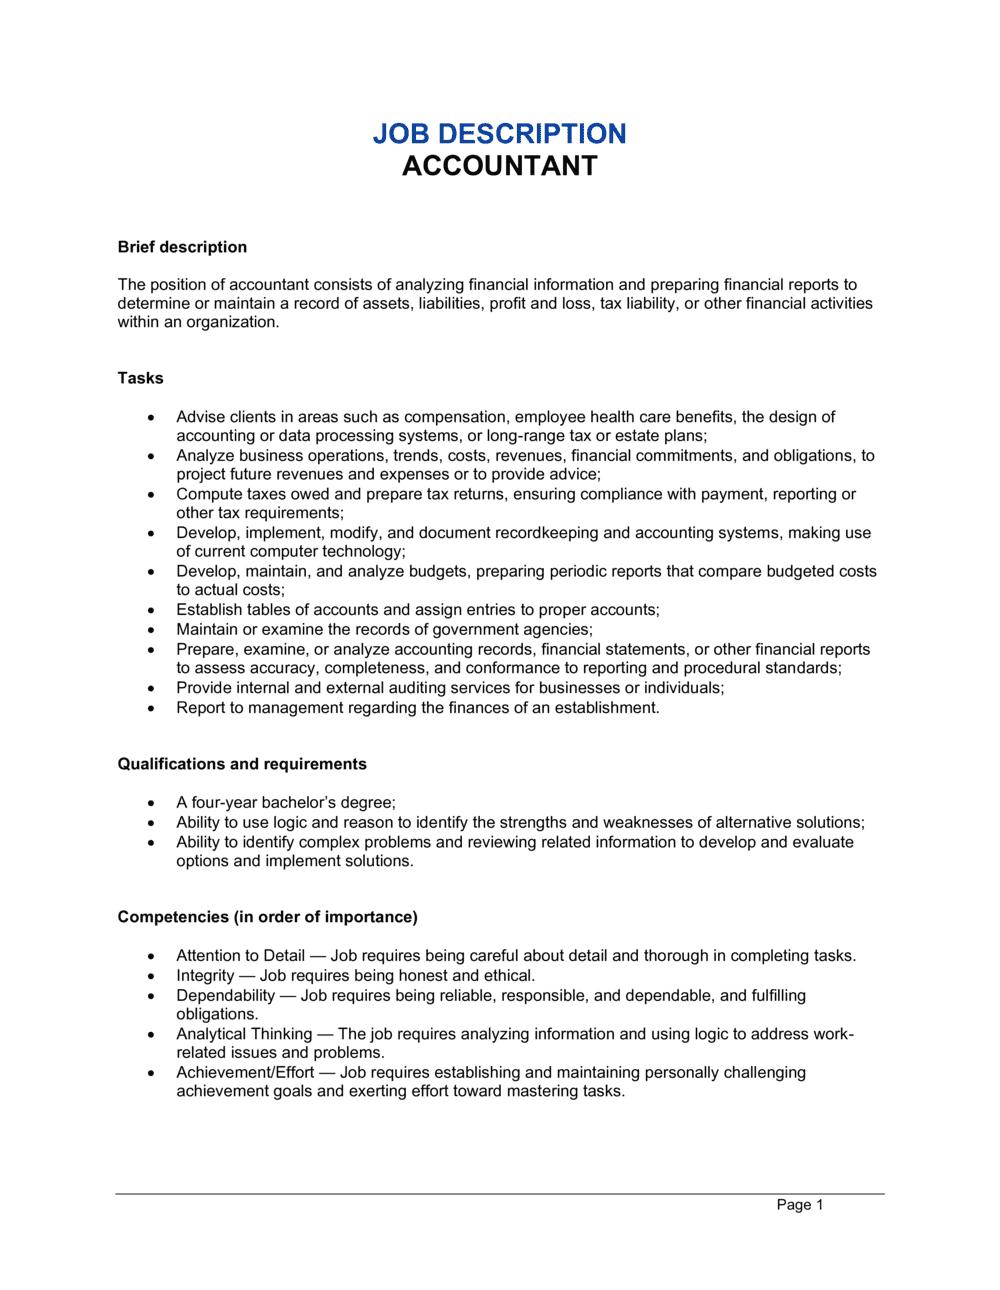 Business-in-a-Box's Accountant Job Description Template